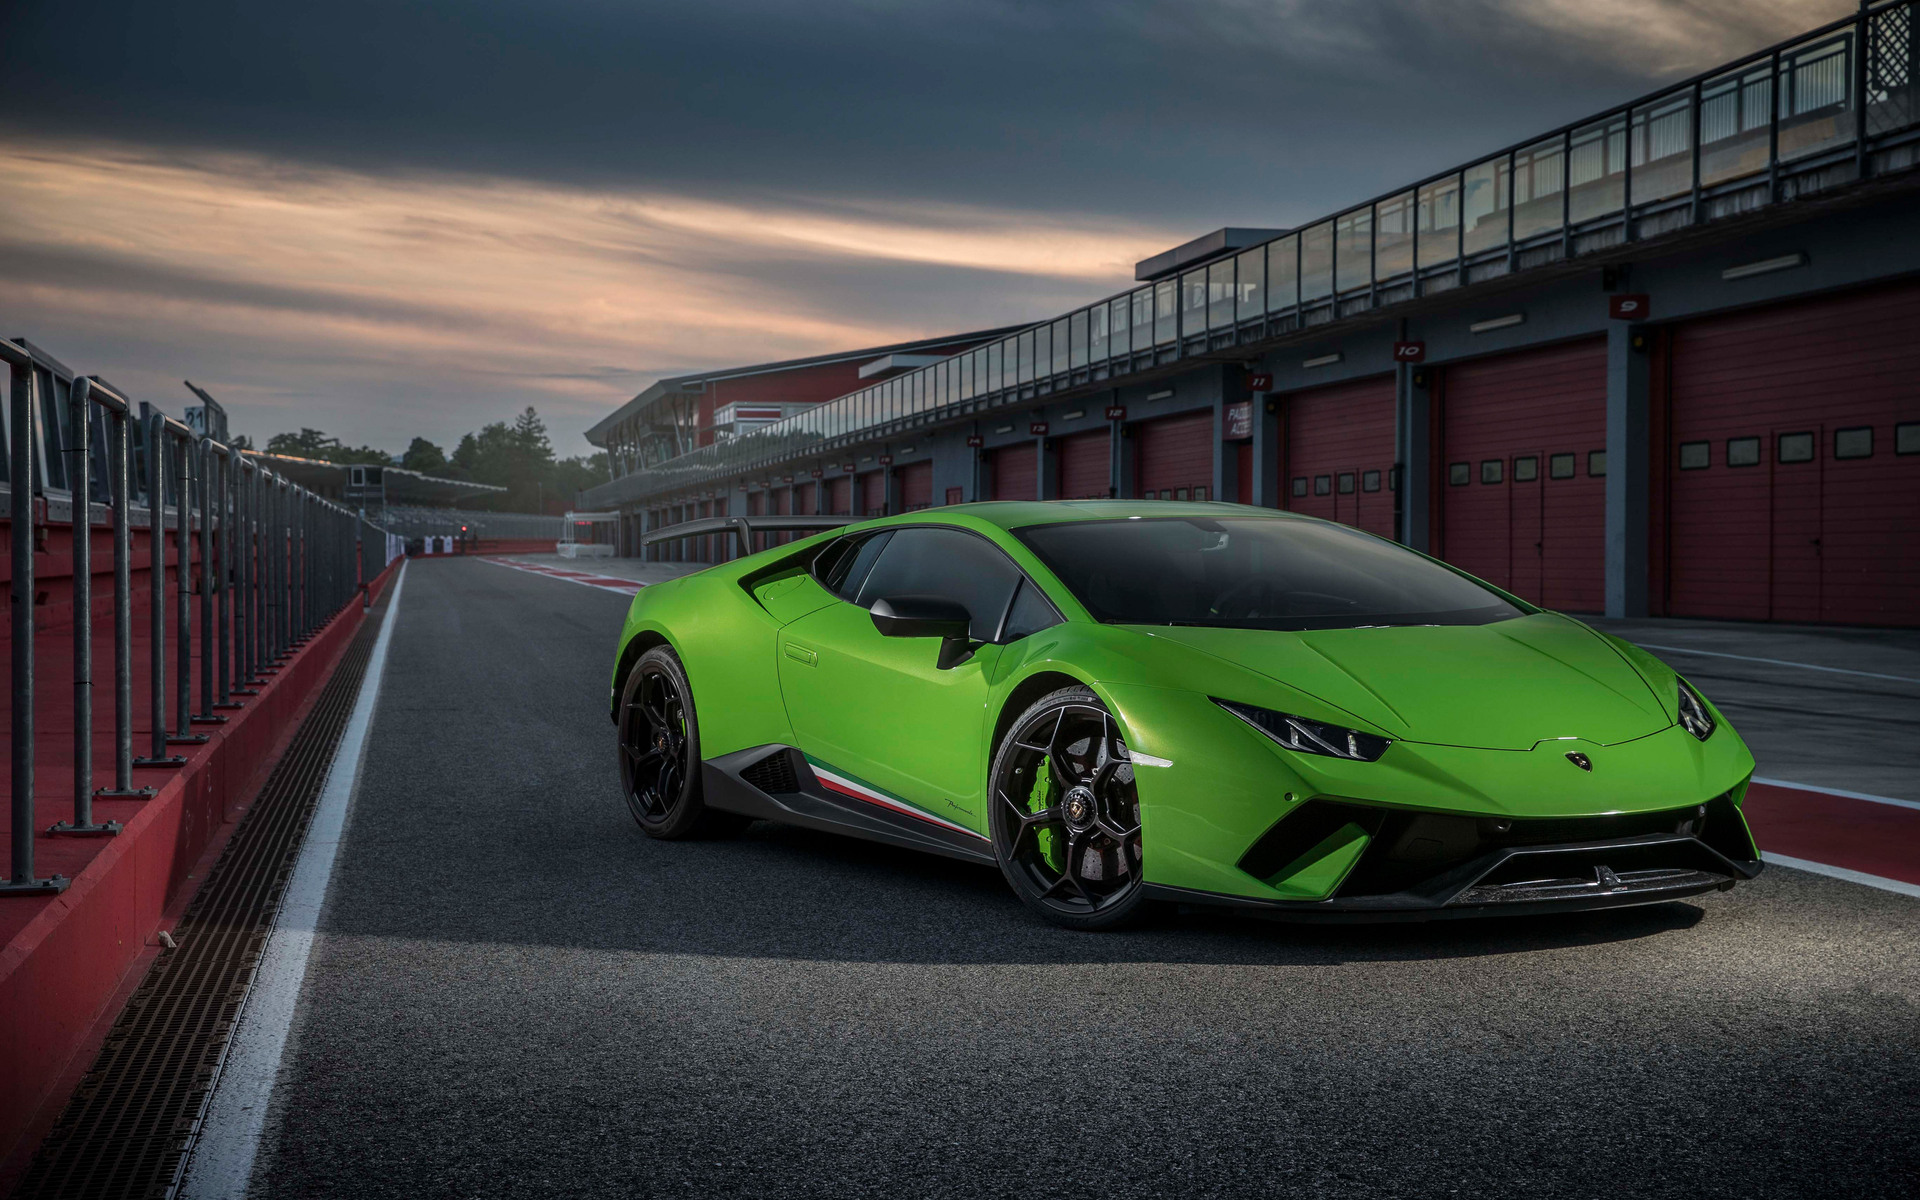 1920x1200 2018 Lamborghini Huracan Performante 4k 1080P ...